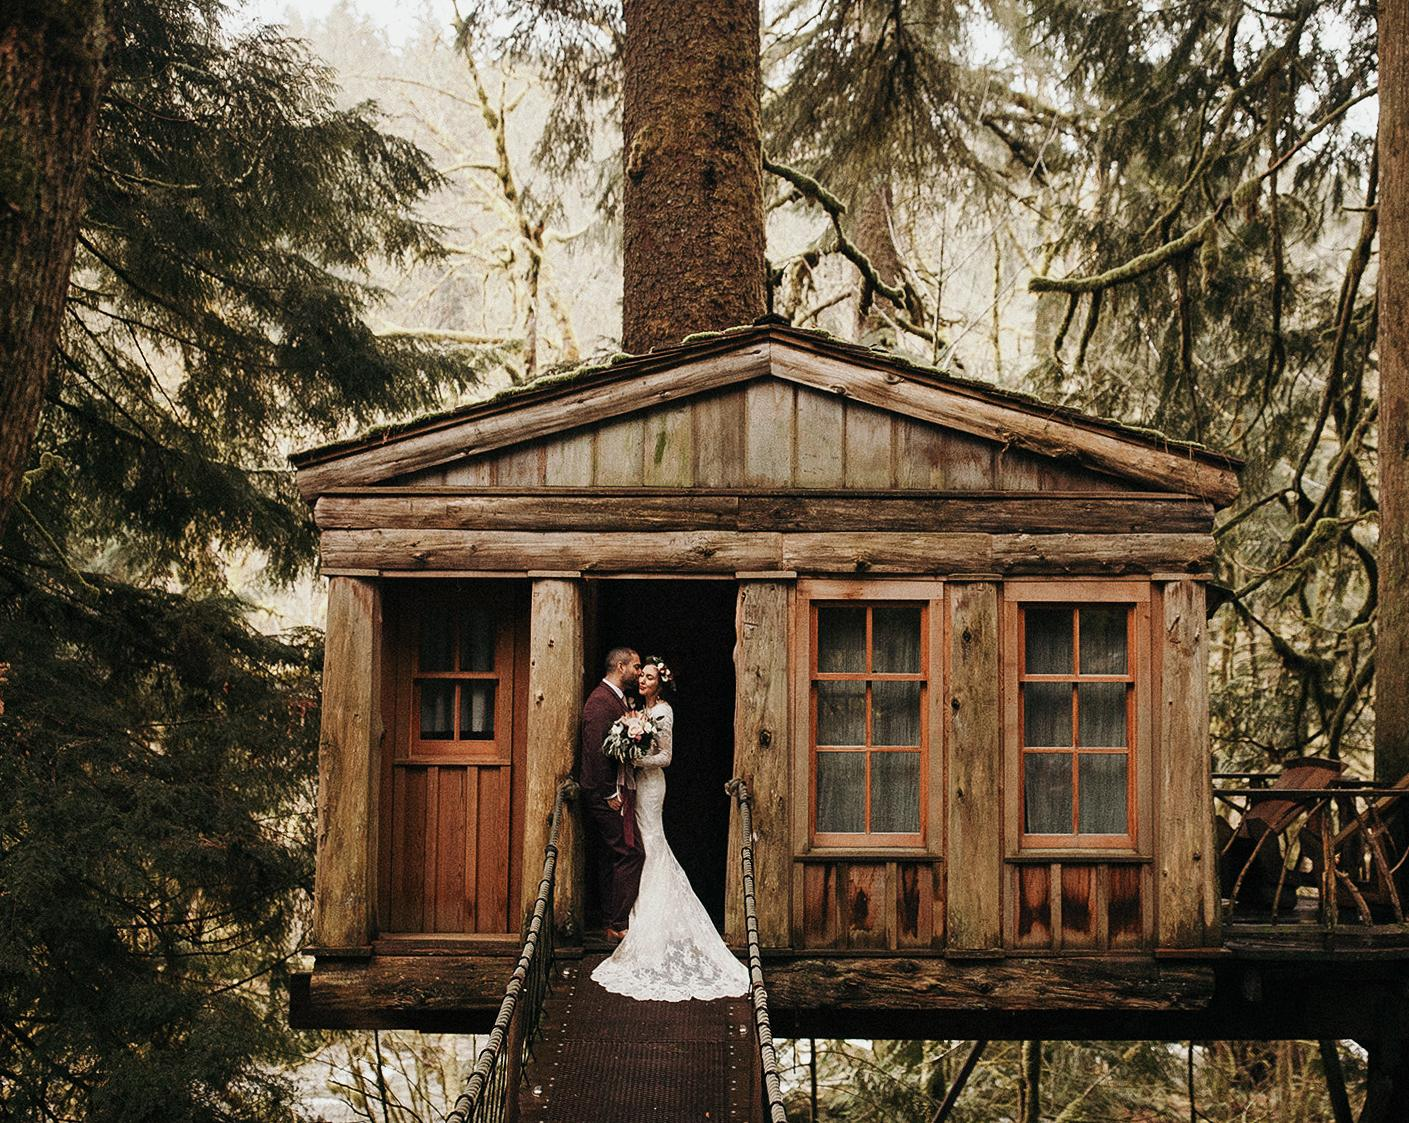 20 Seriously Stunning Washington Wedding Venues Youll Love